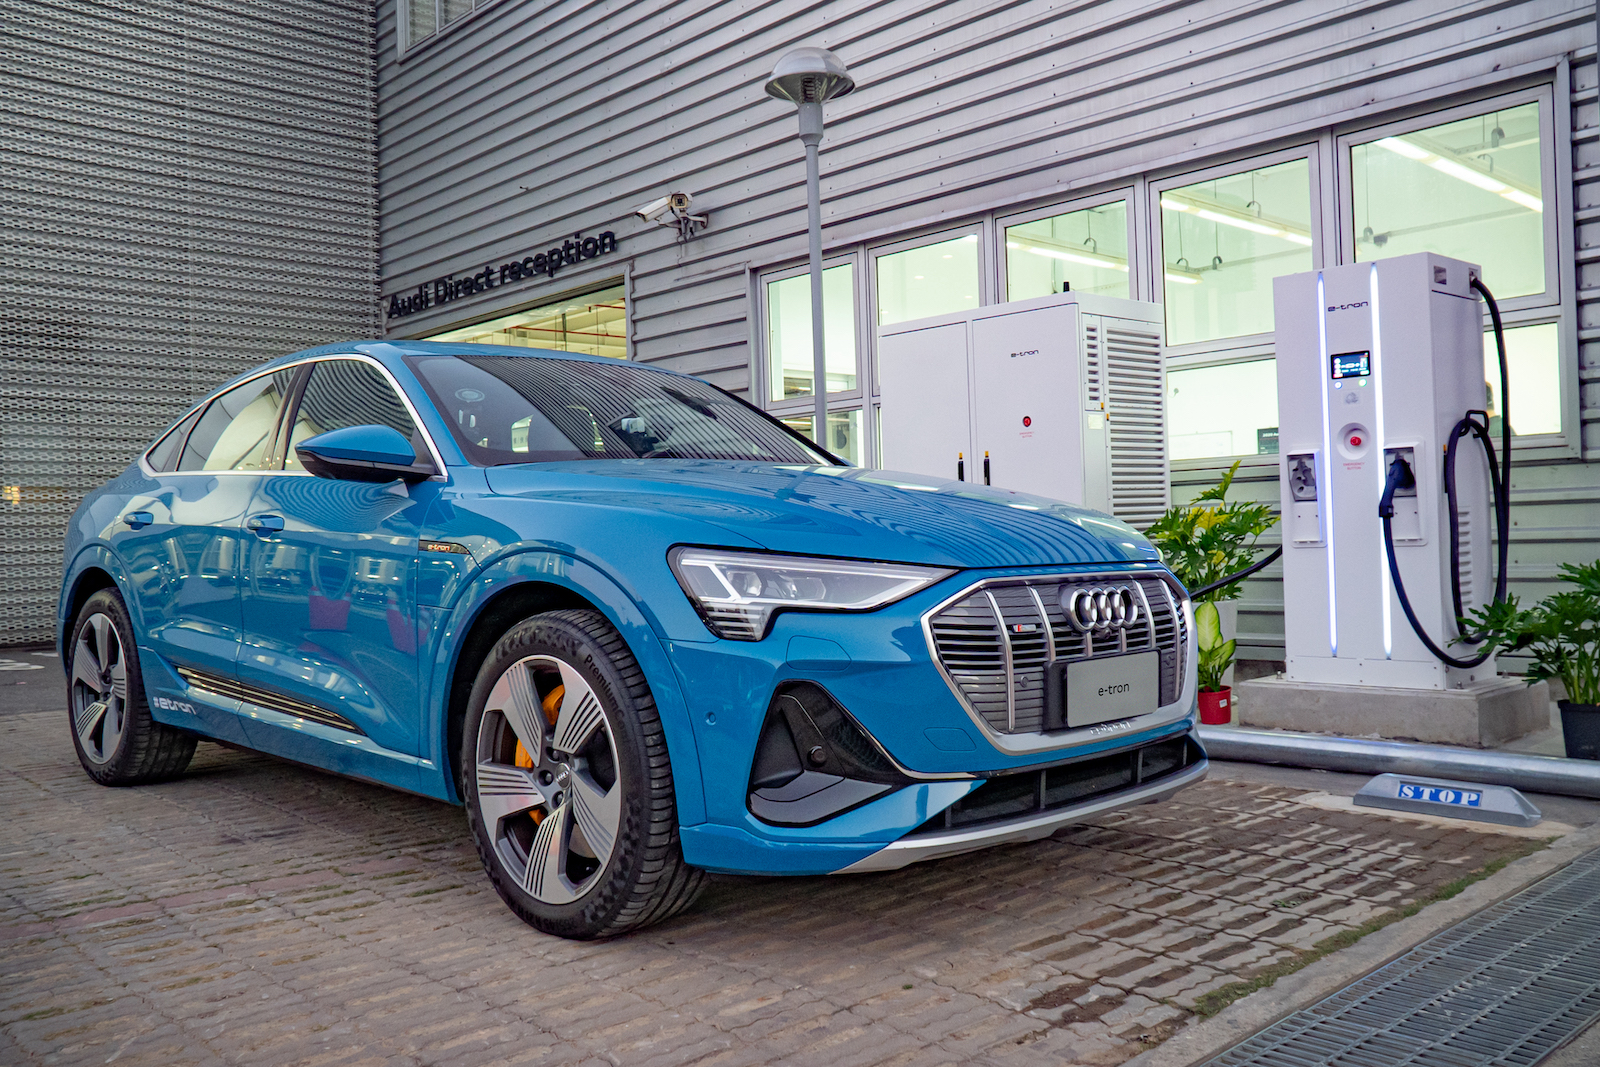 Audi 經銷據點的快充樁歡迎其他品牌電動車前往使用。